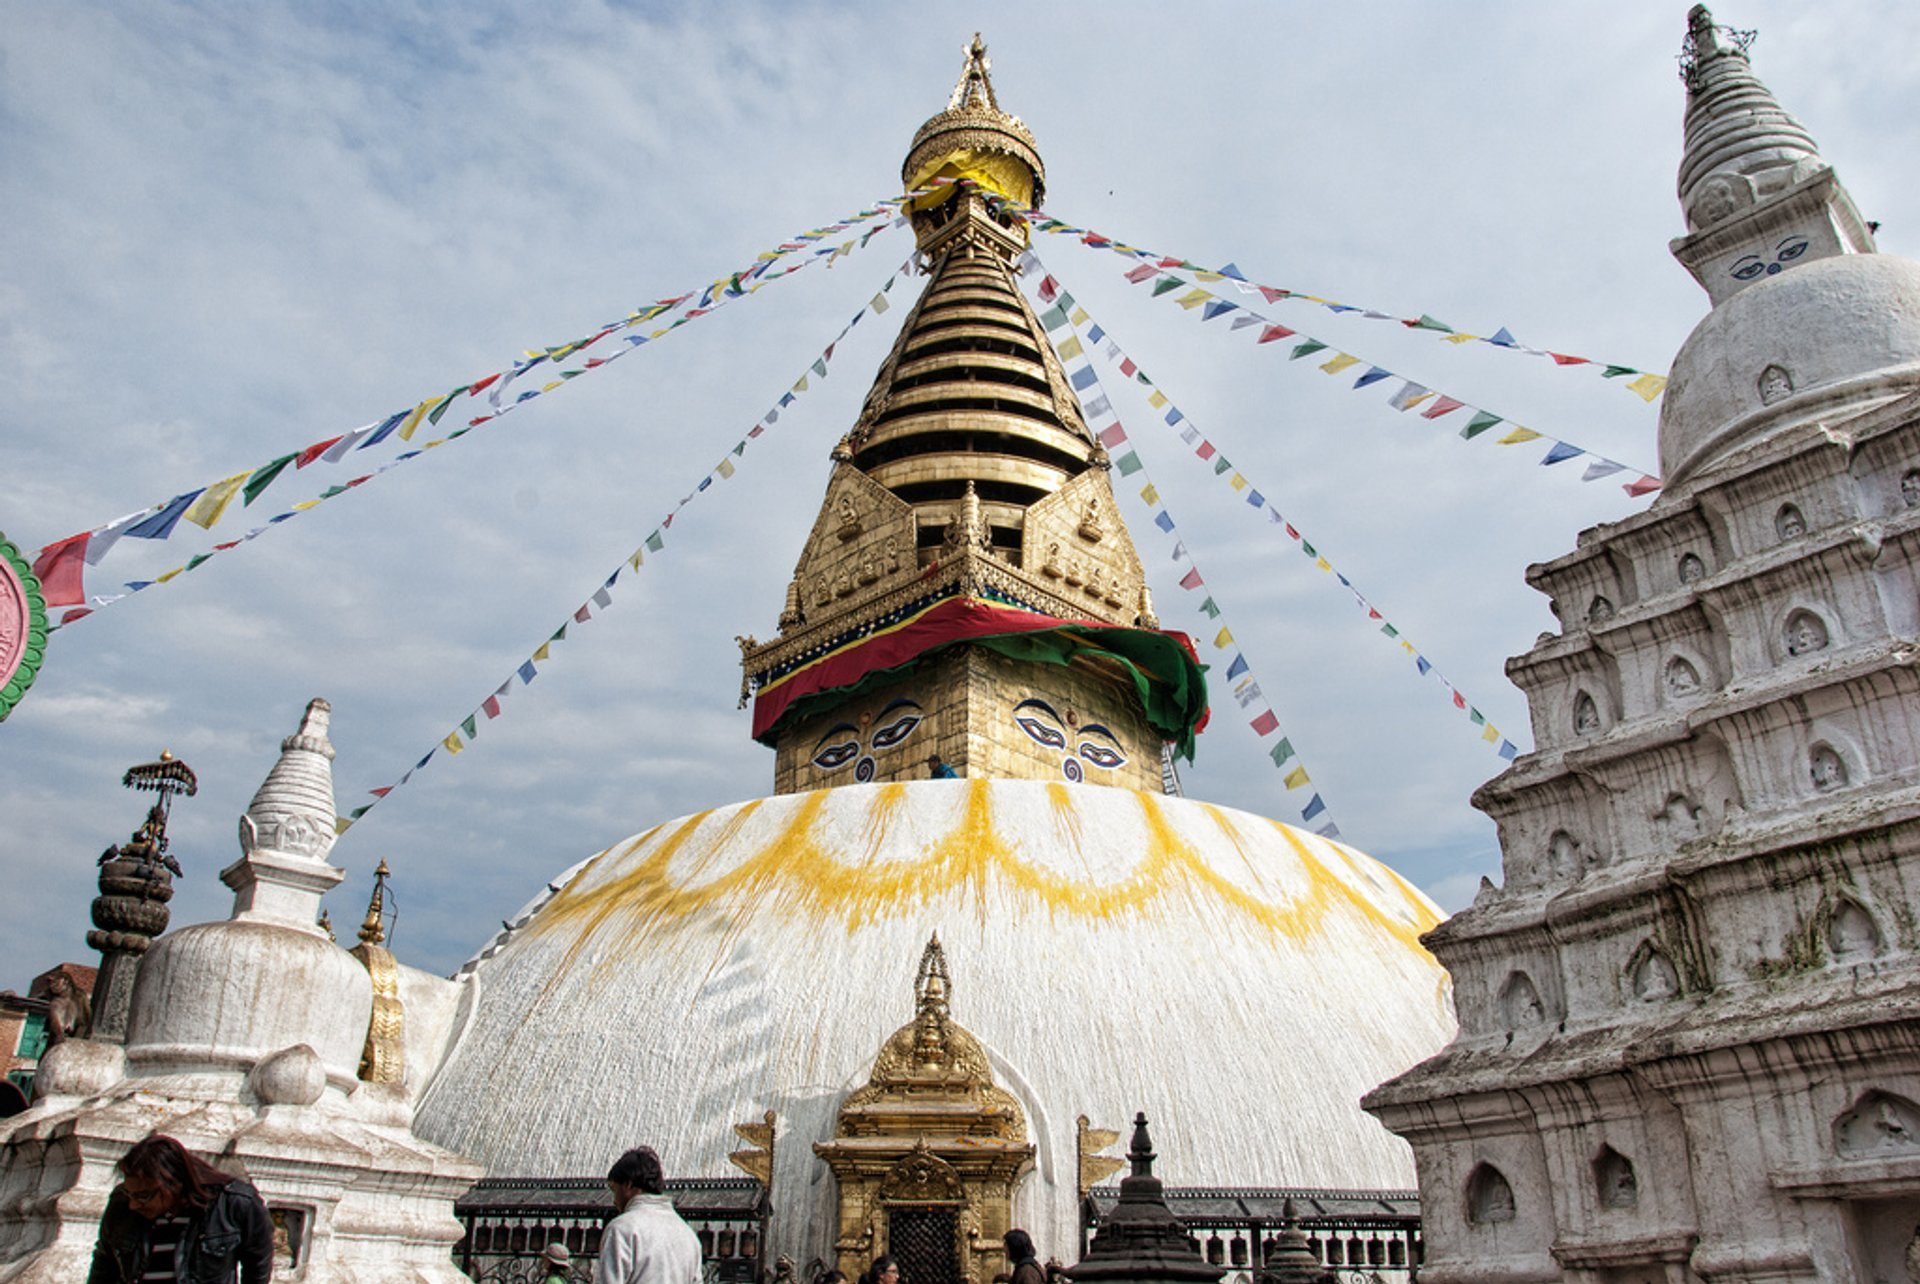 Swayambhunath (Monkey Temple) in Kathmandu 2019 - Best Time